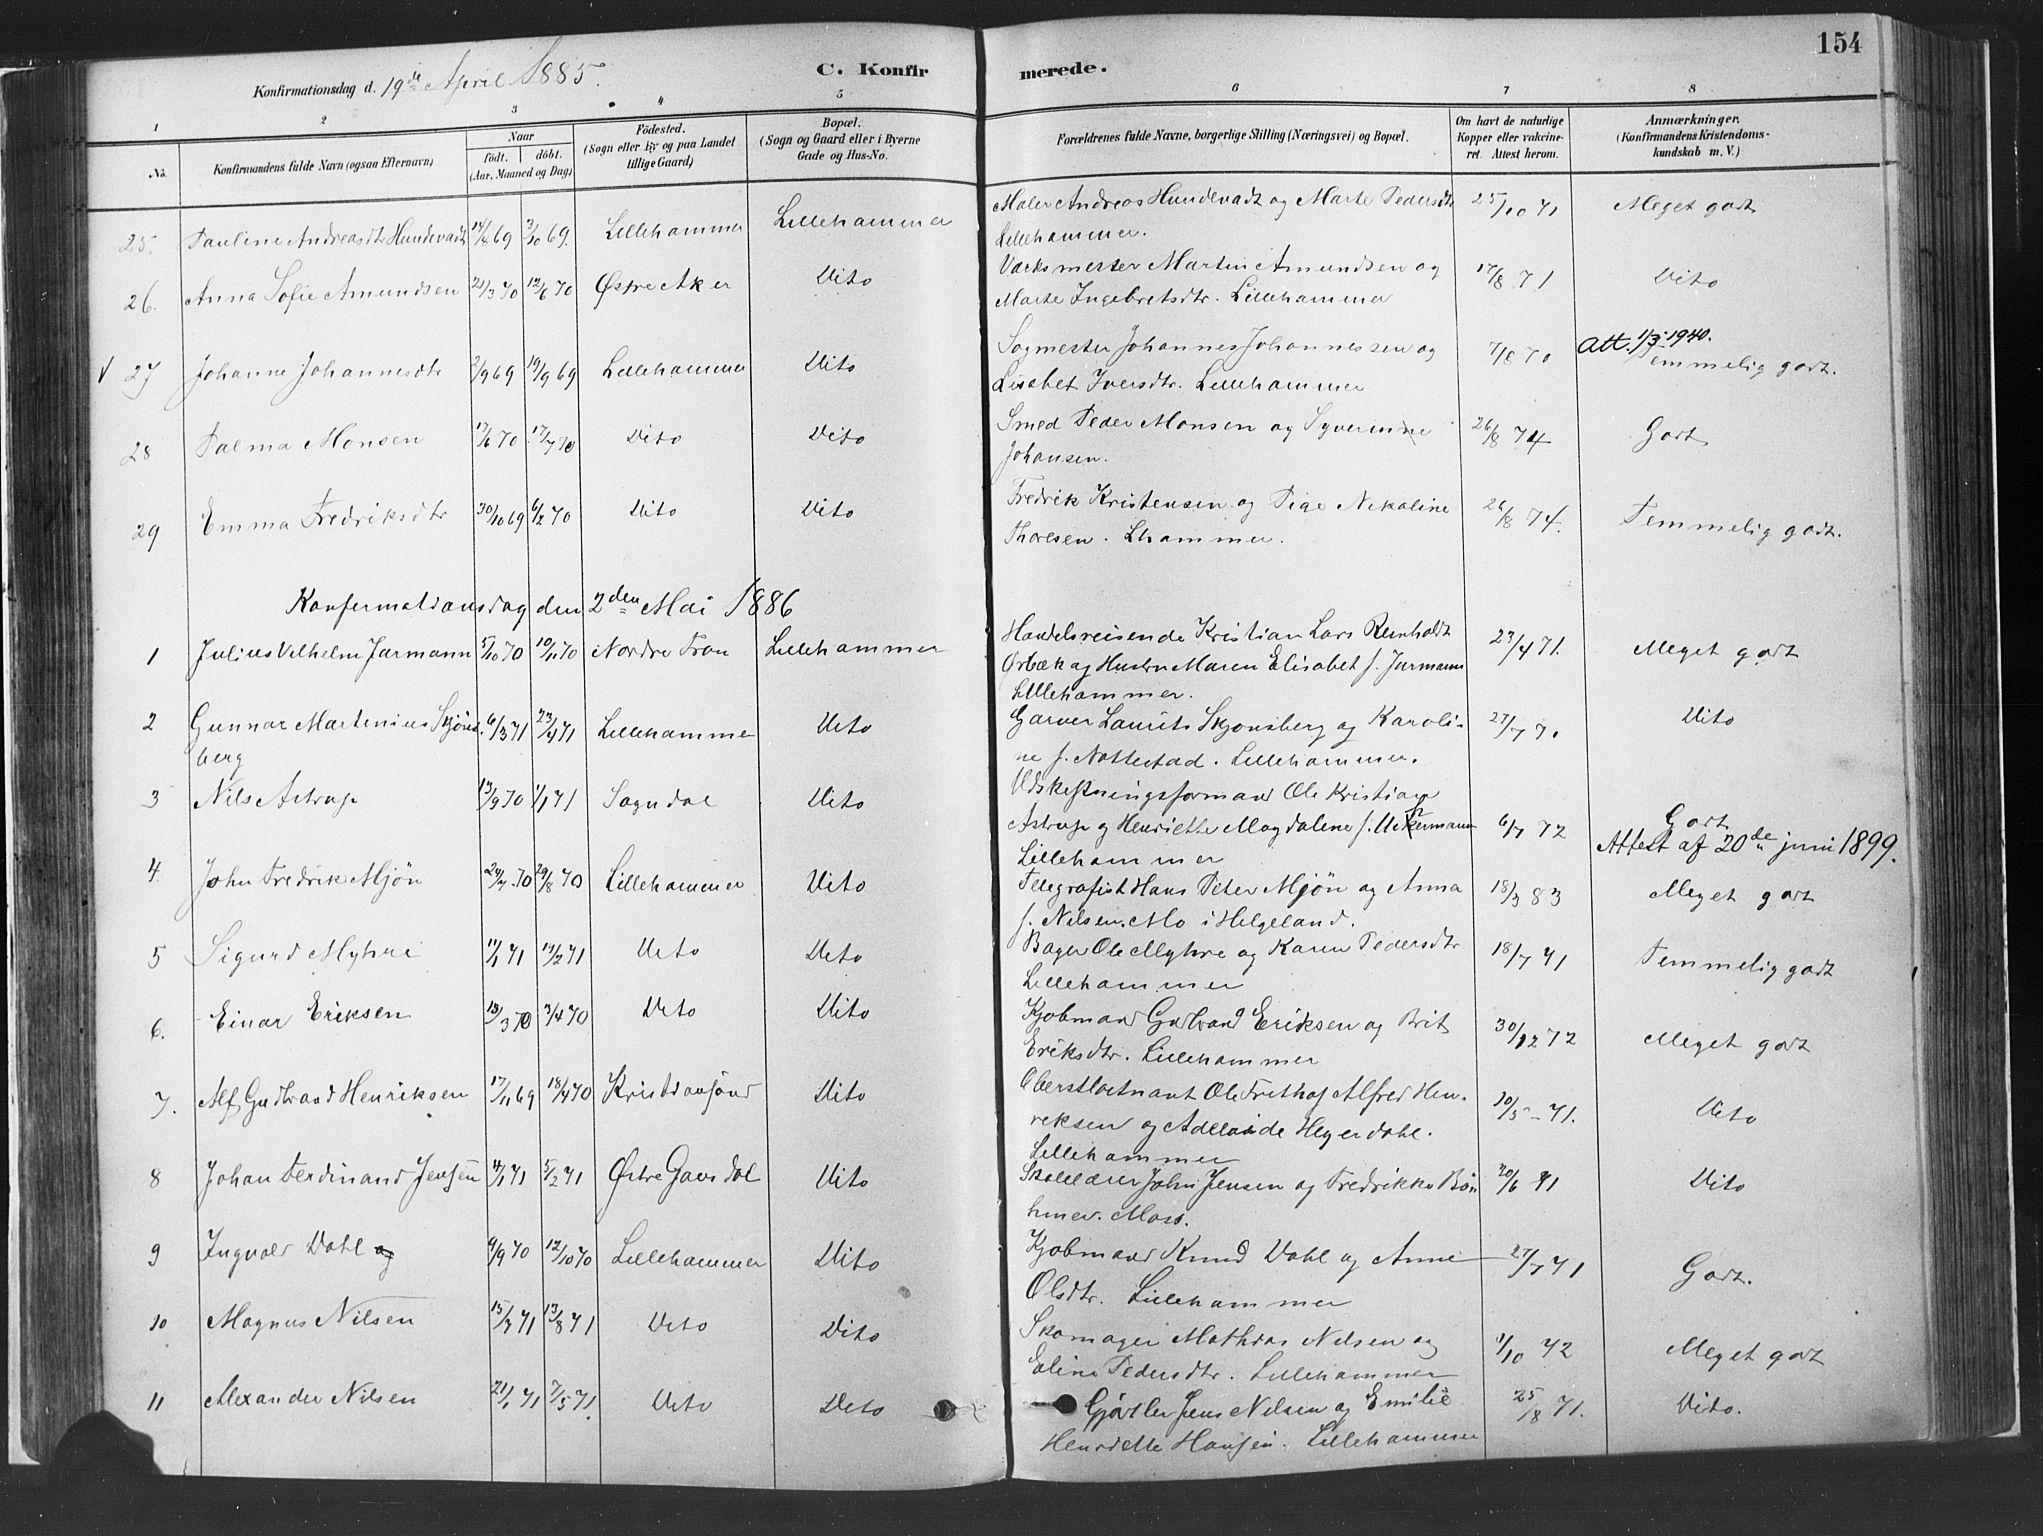 SAH, Fåberg prestekontor, Ministerialbok nr. 10, 1879-1900, s. 154